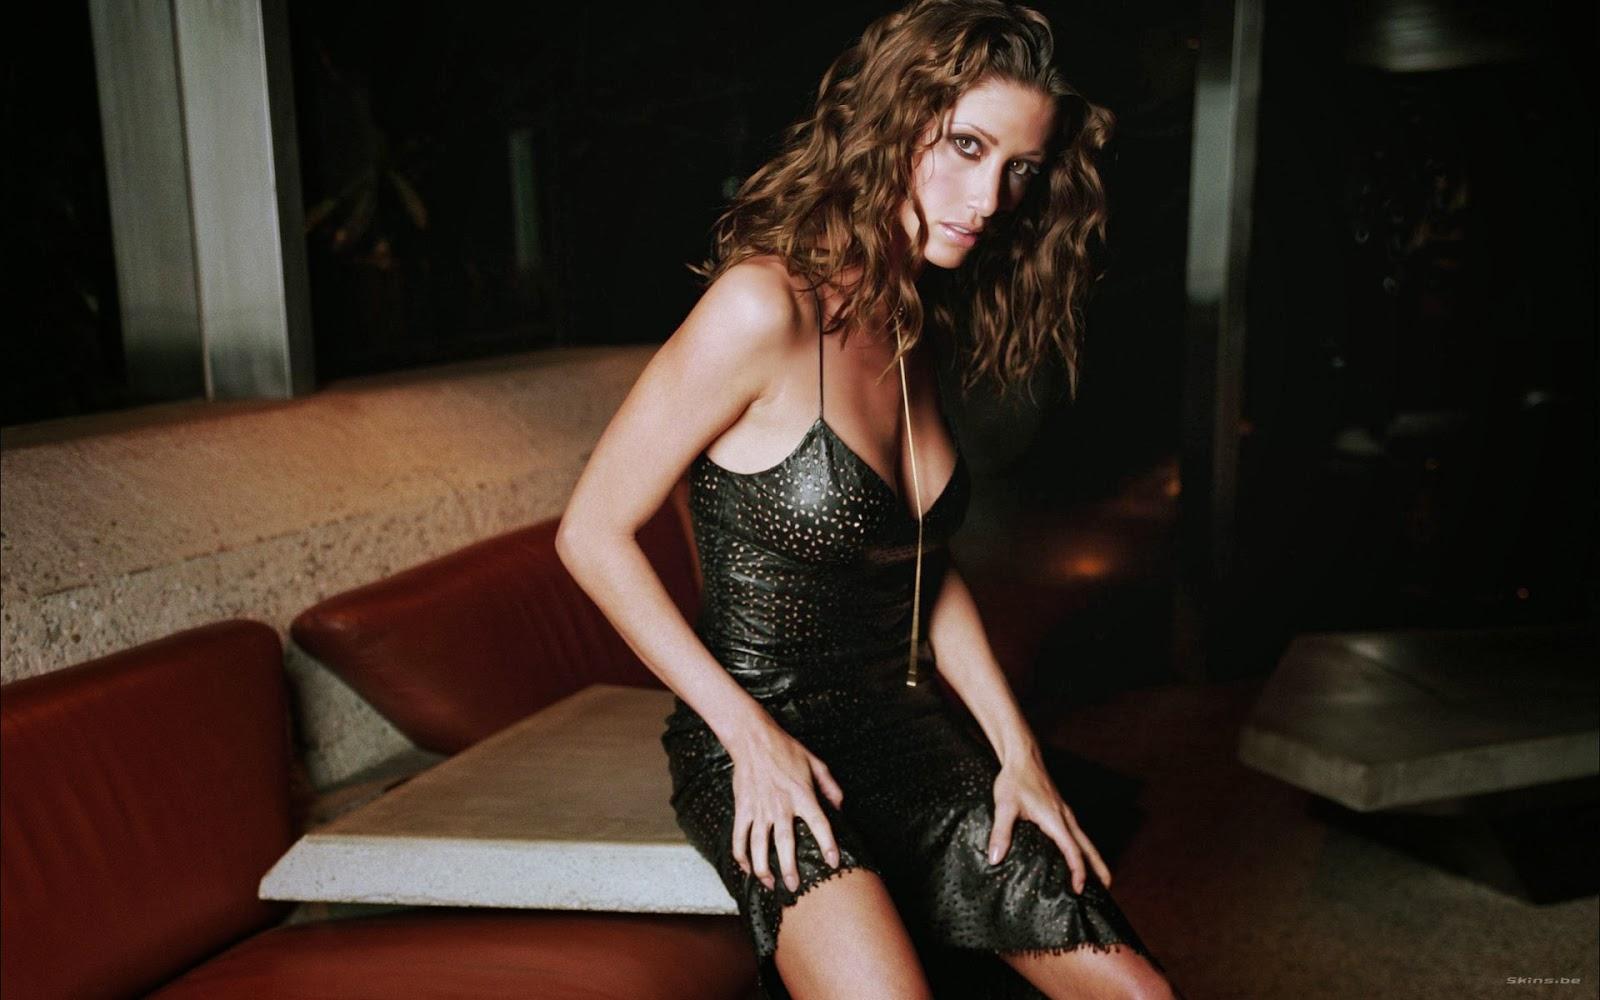 sanaa lathan hot sexy topless